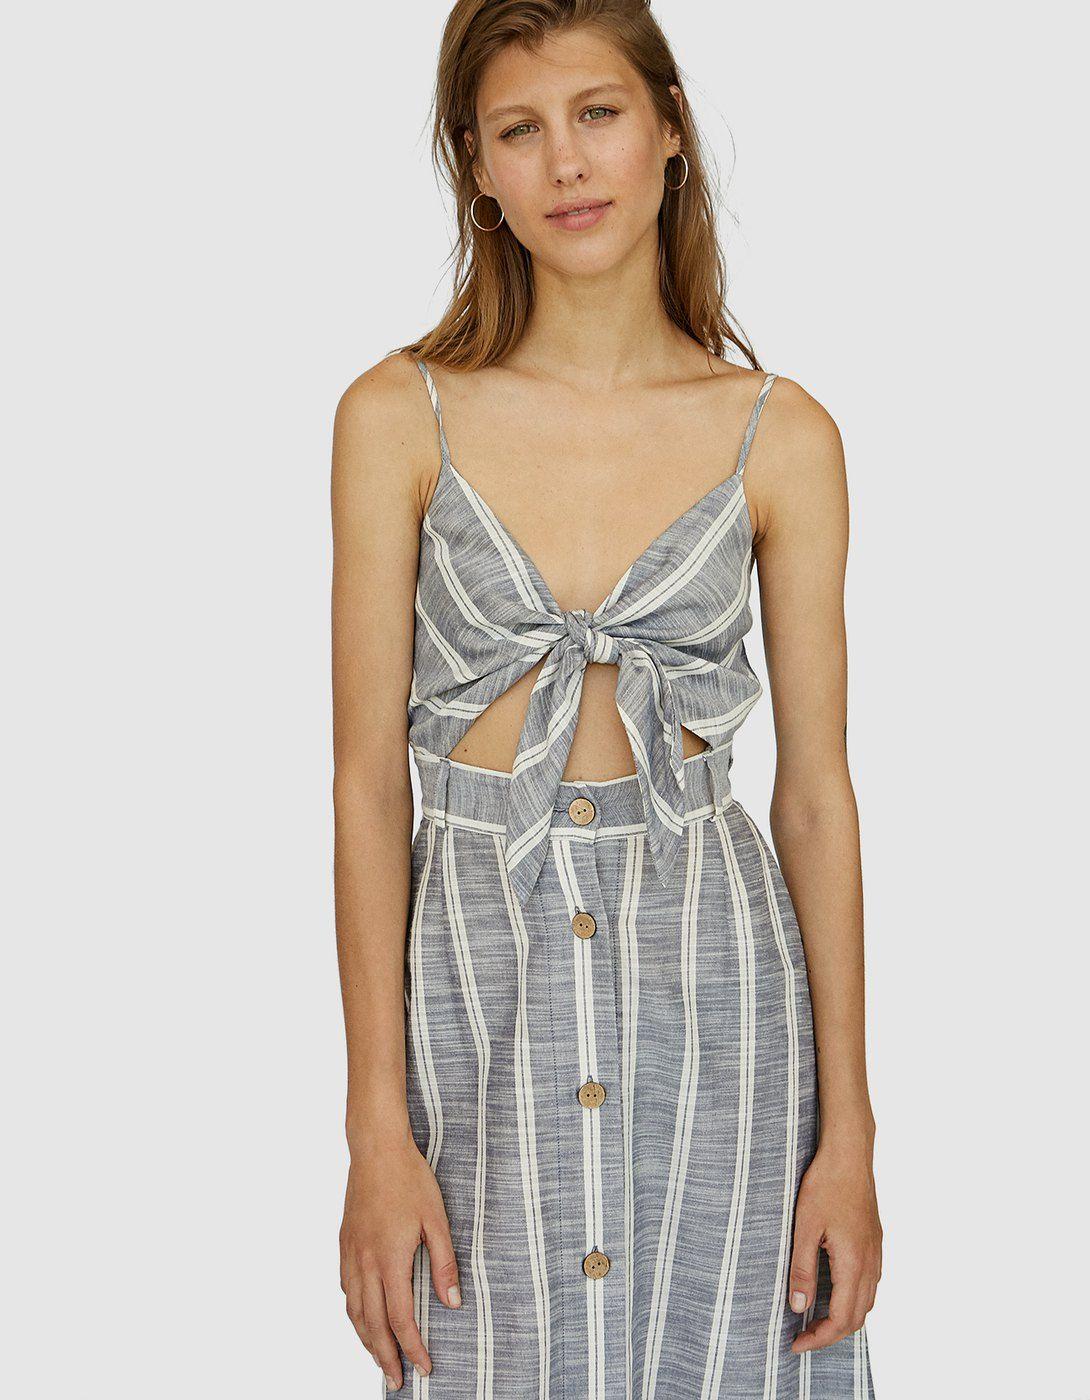 087c7af7e3ad Striped linen dress - Just In